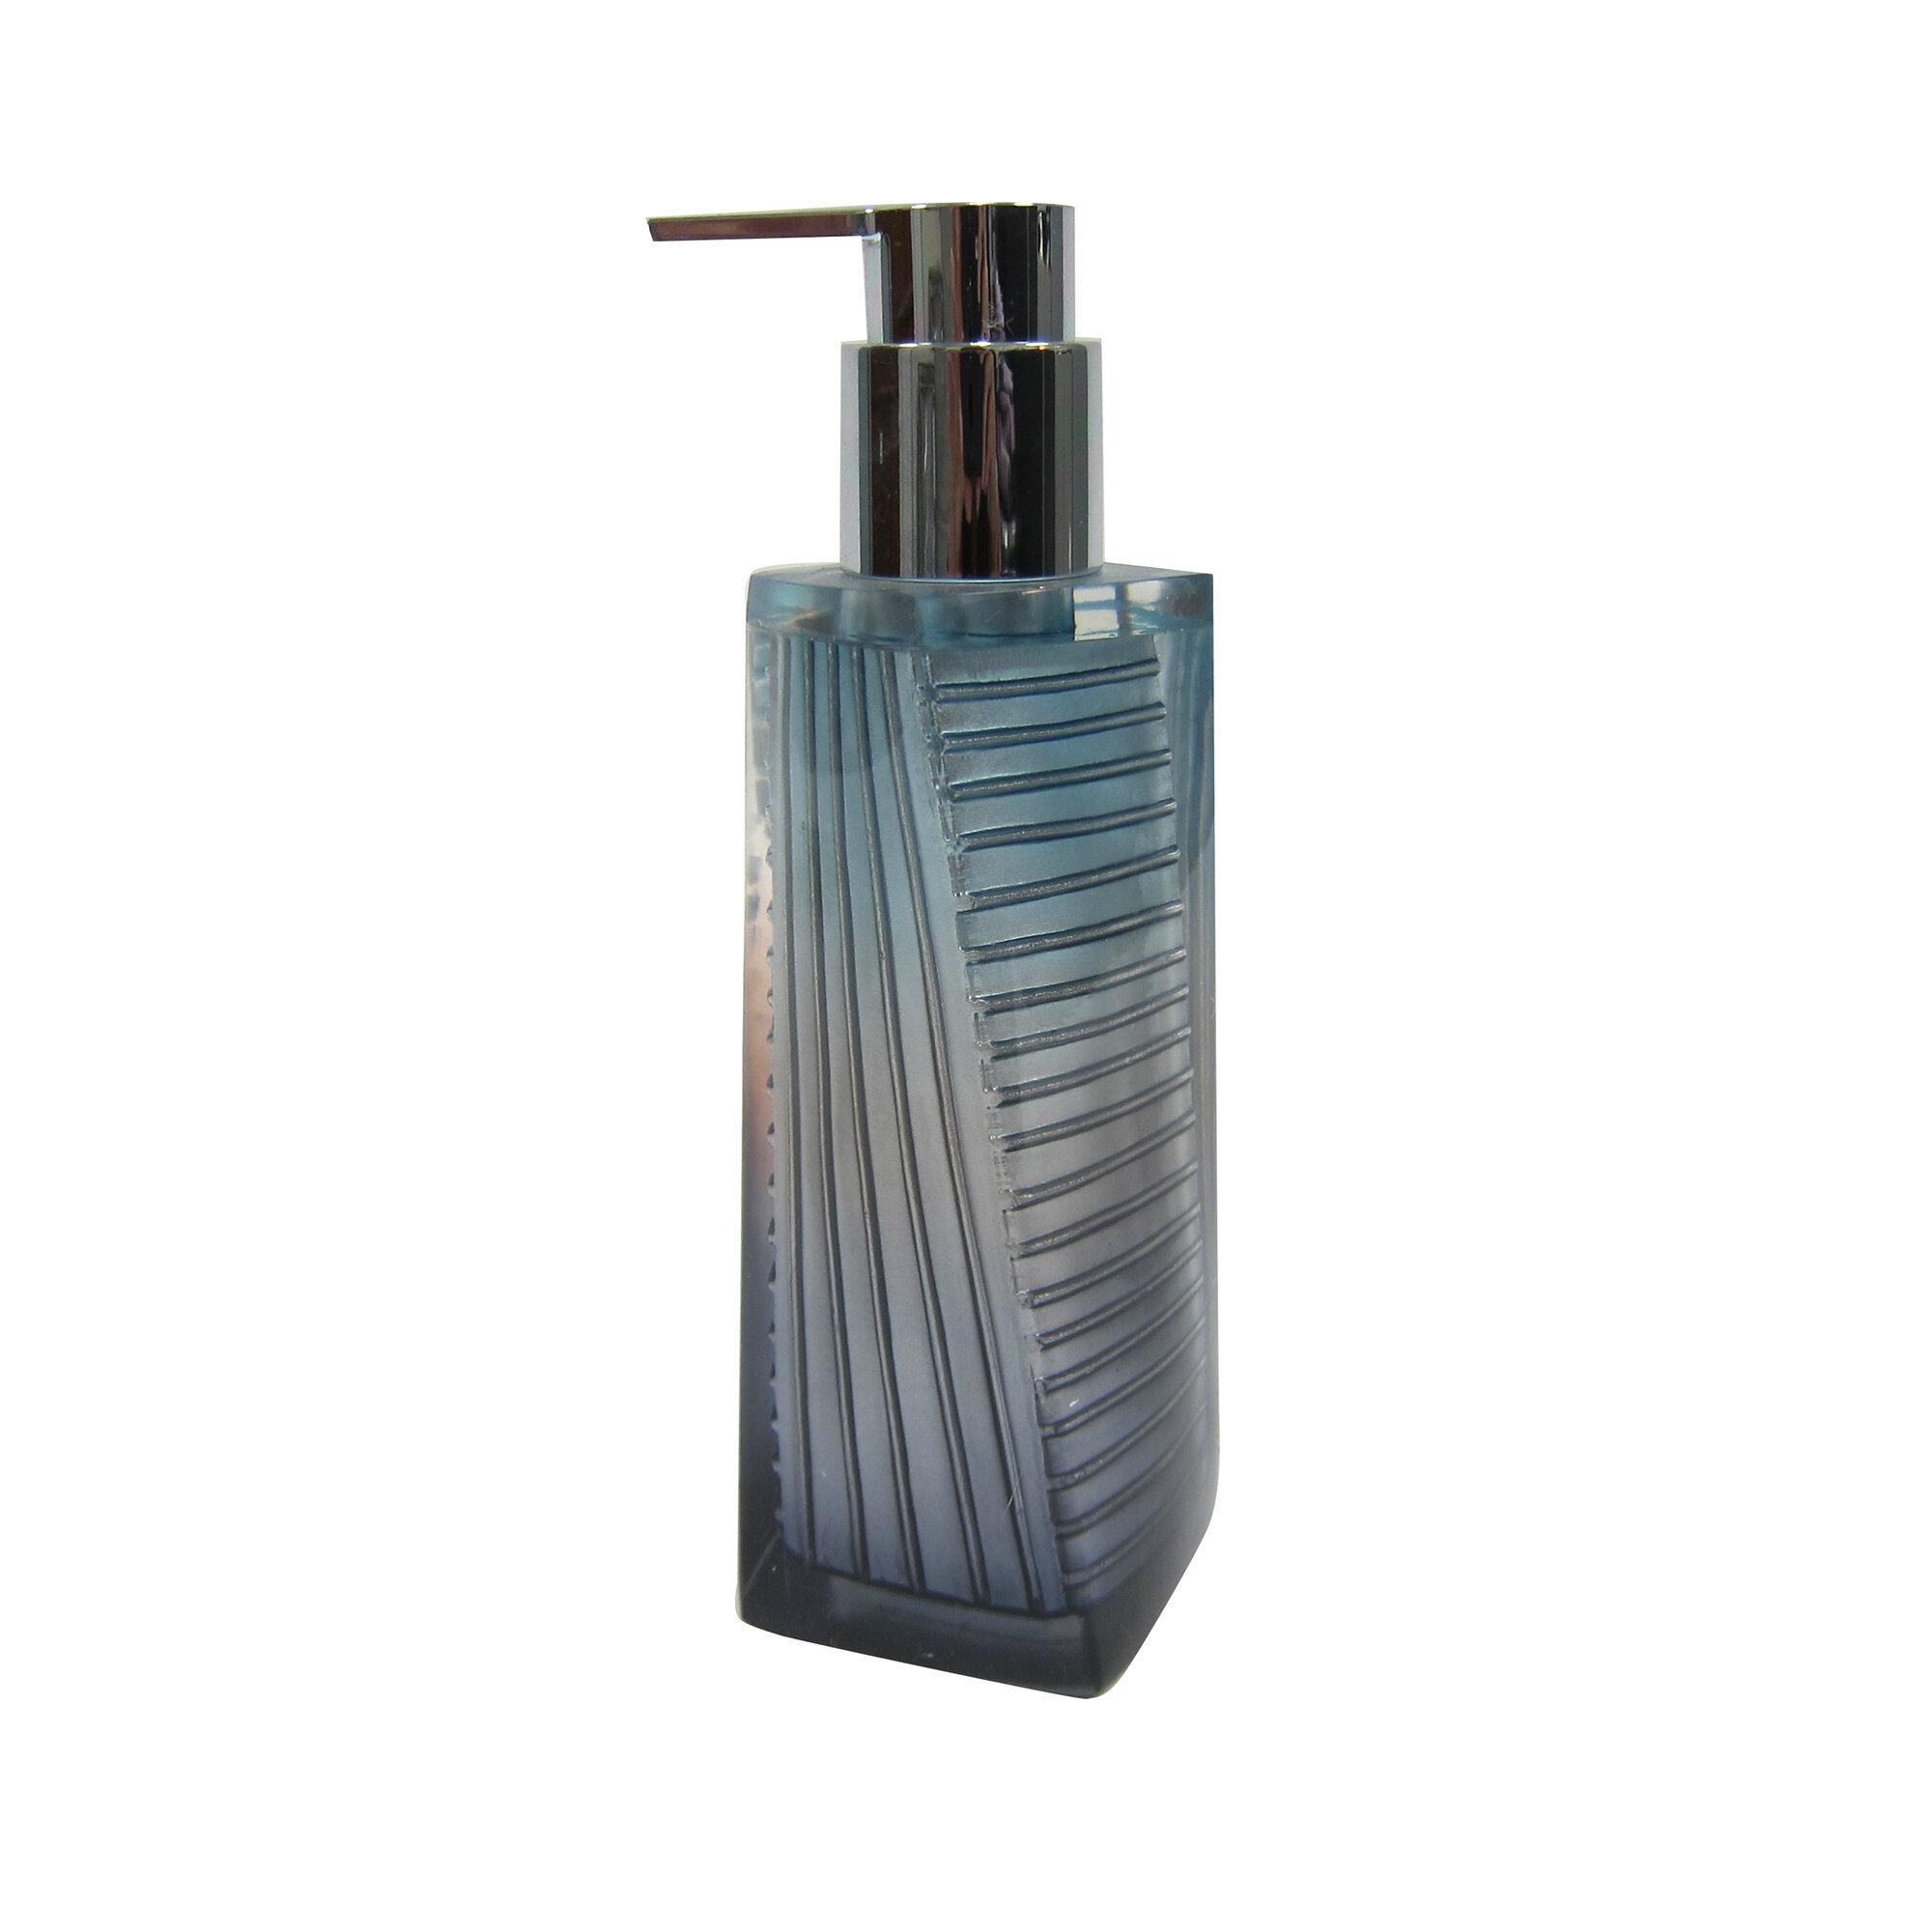 Soap Dispenser Croscill Home Fashions Countertop Bath Accessories You Ll Love In 2021 Wayfair